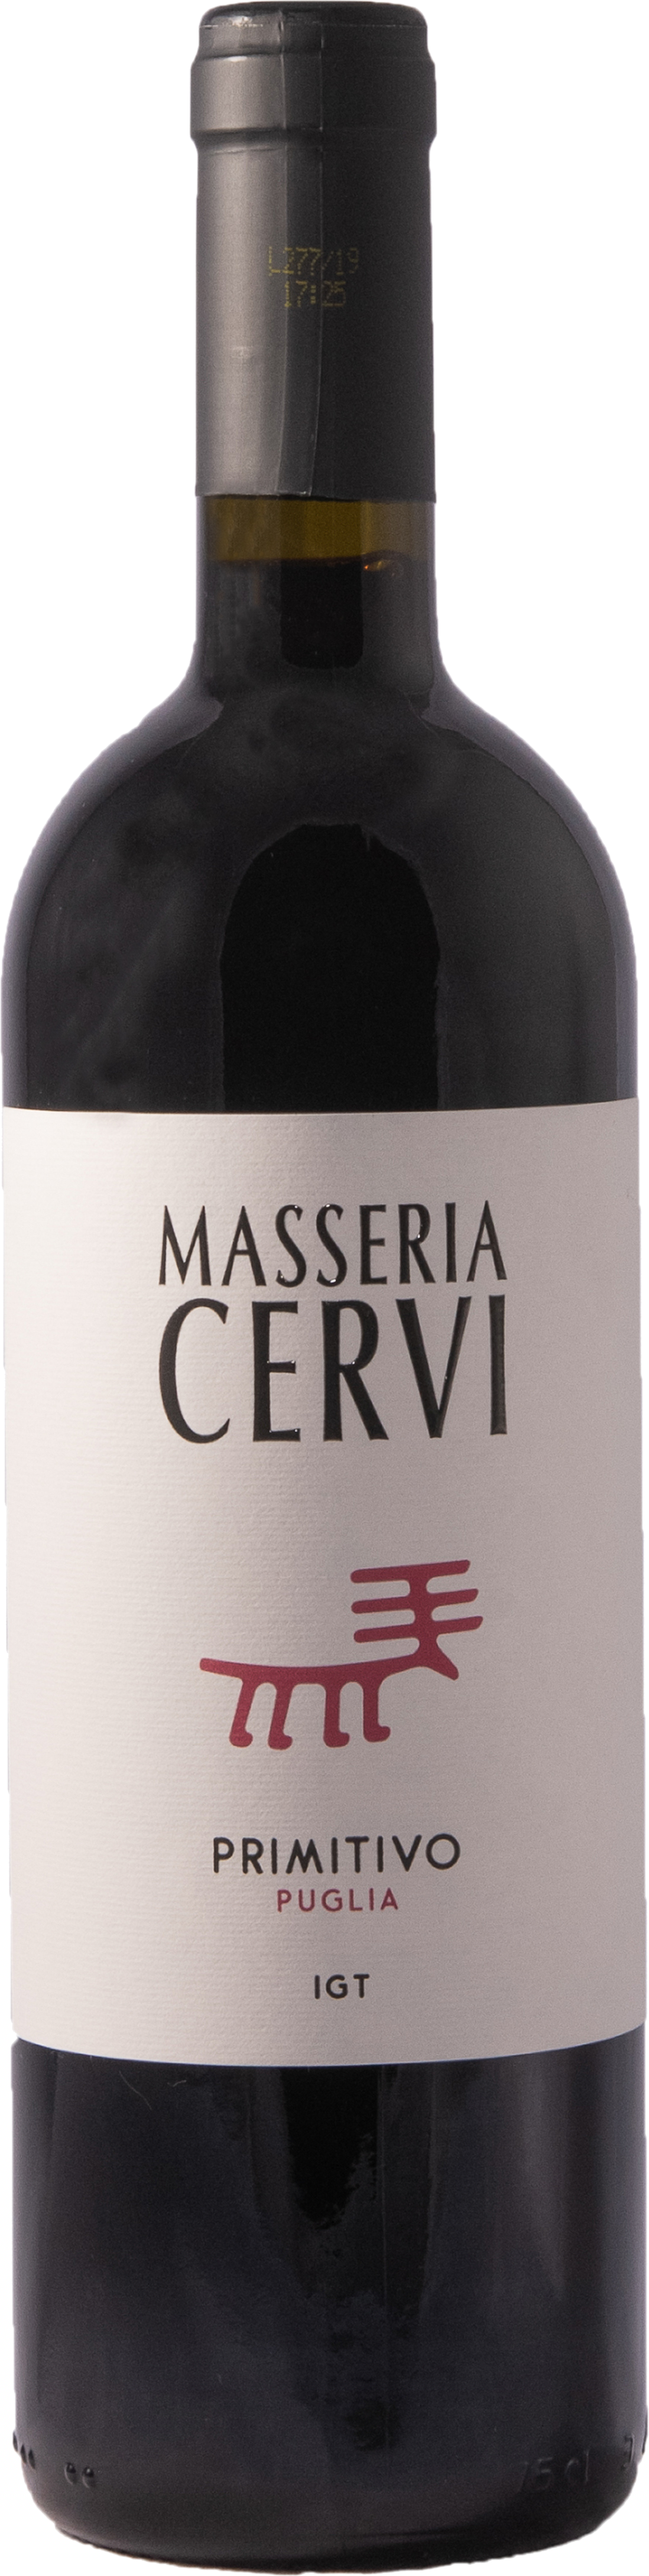 Primitivo IGT 2018 • Masseria Cervi